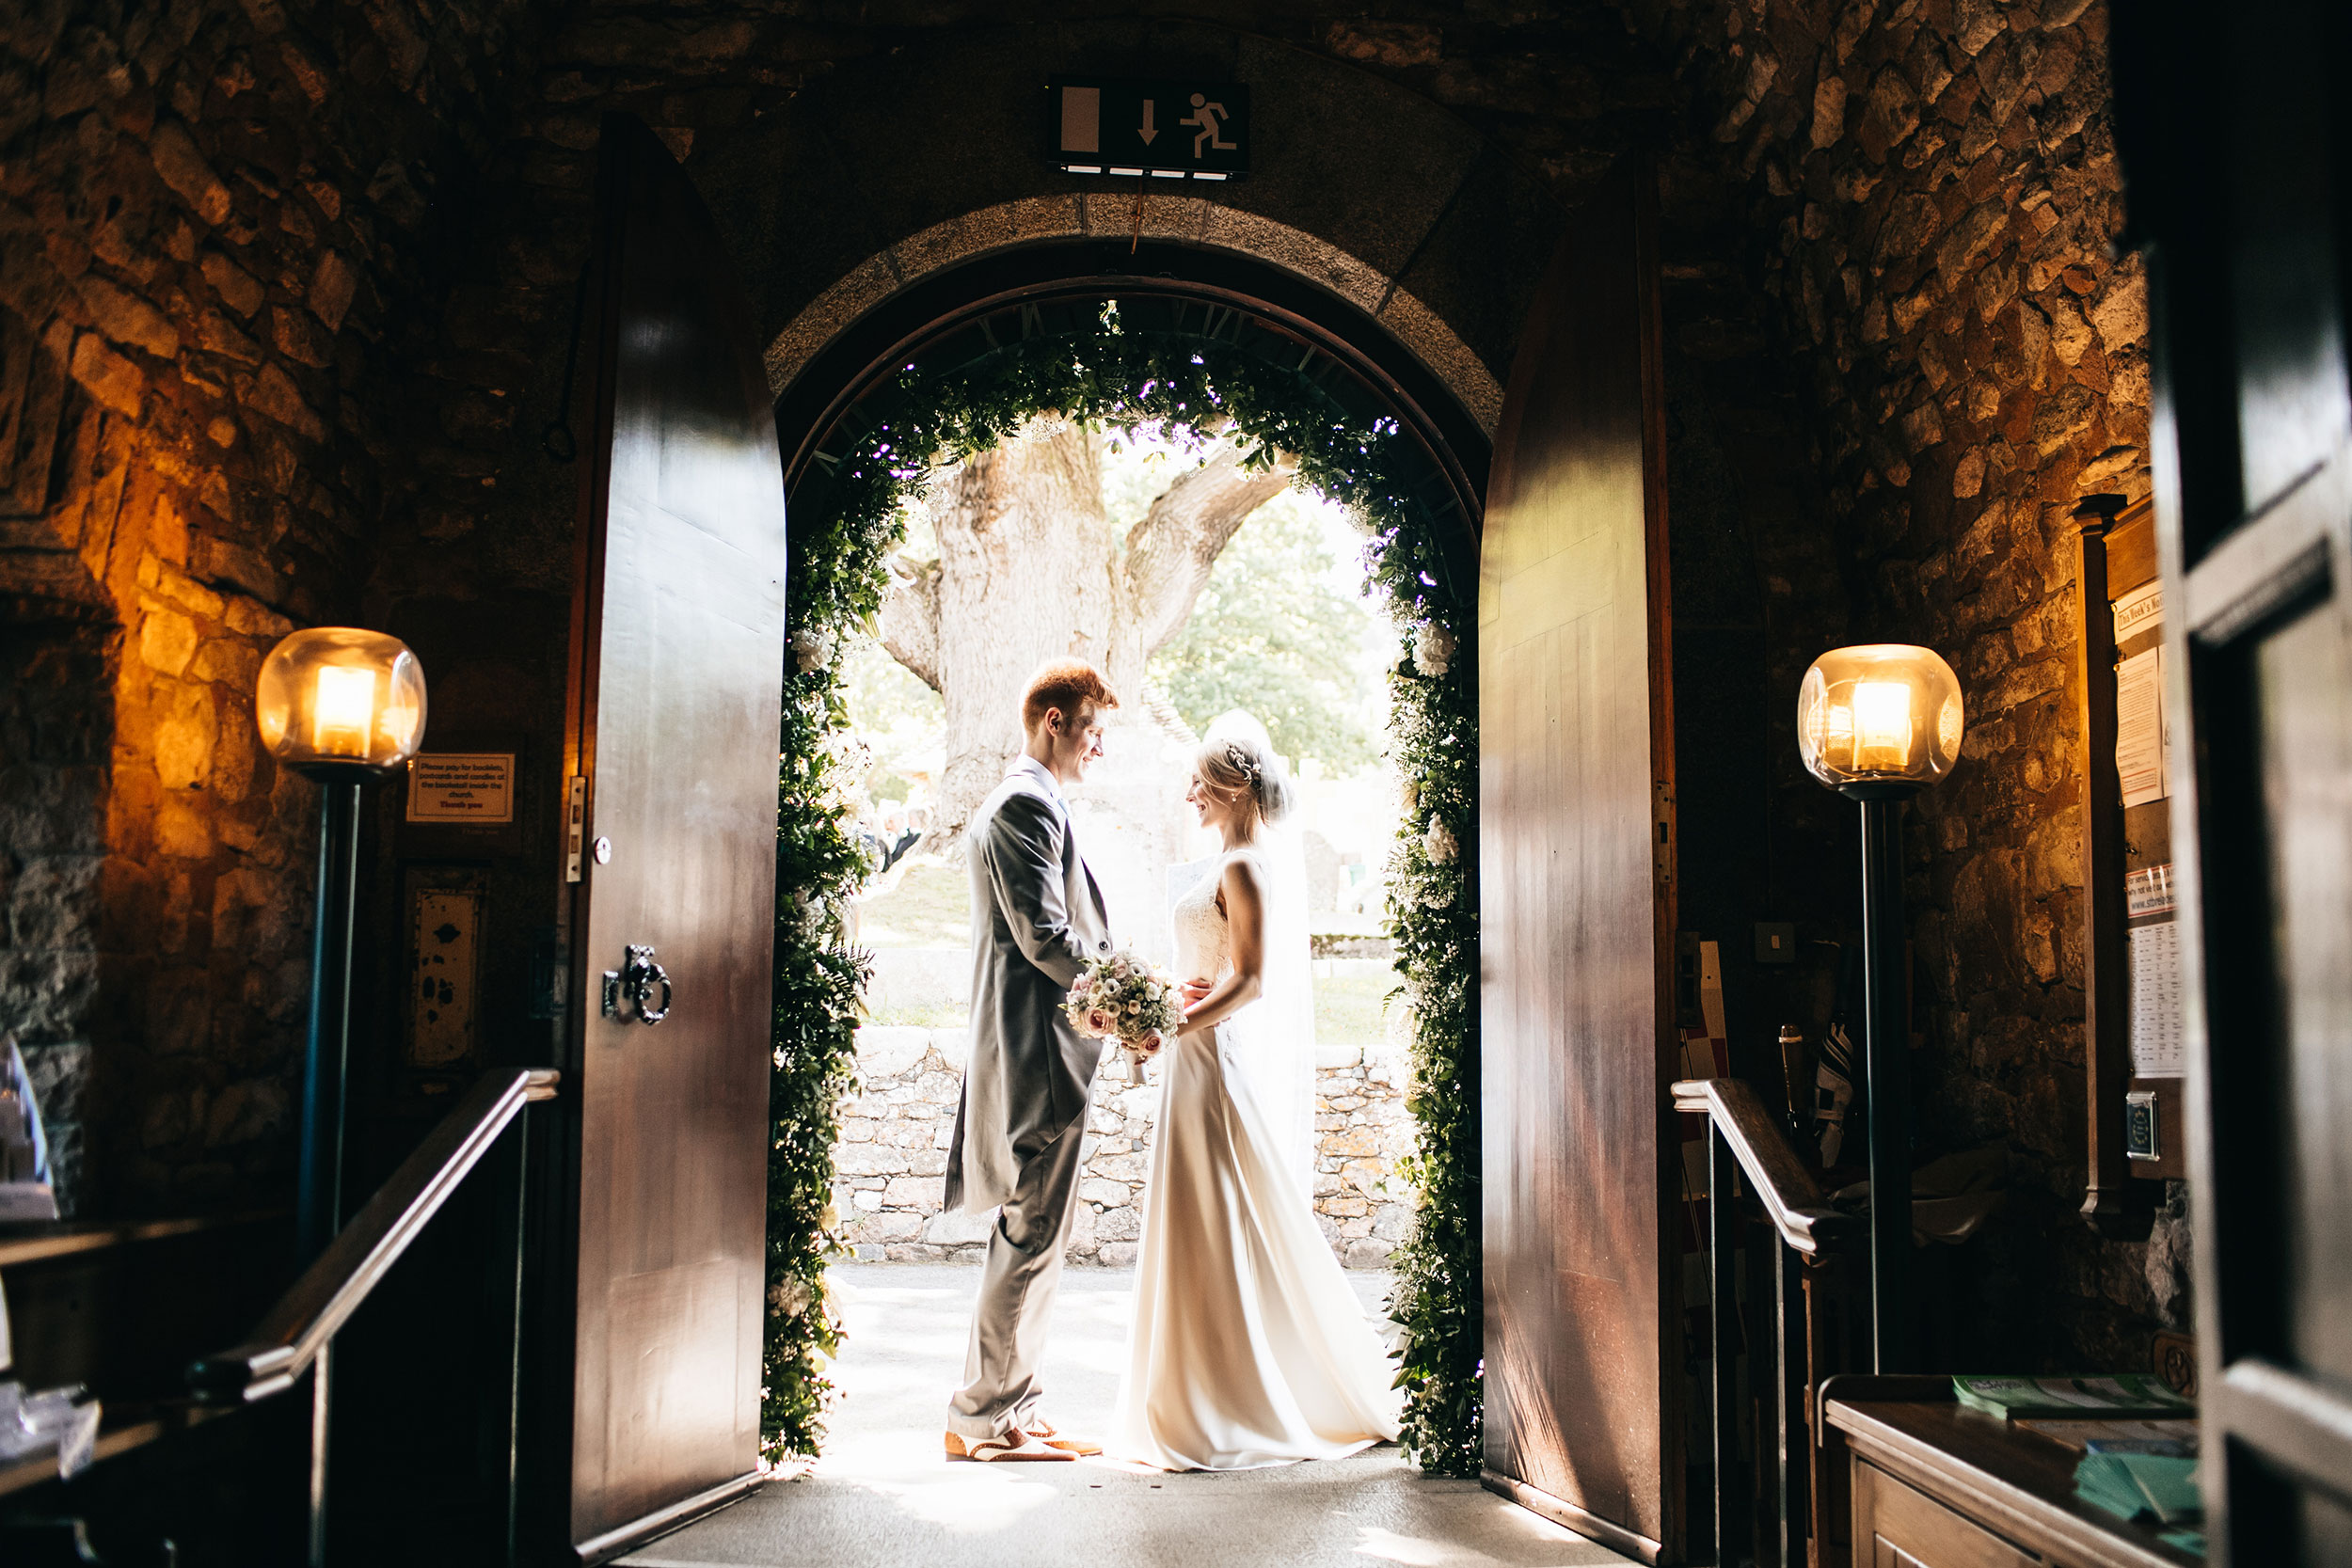 0466_Wedding-Laura-&-Callum-July-2nd_1544.jpg